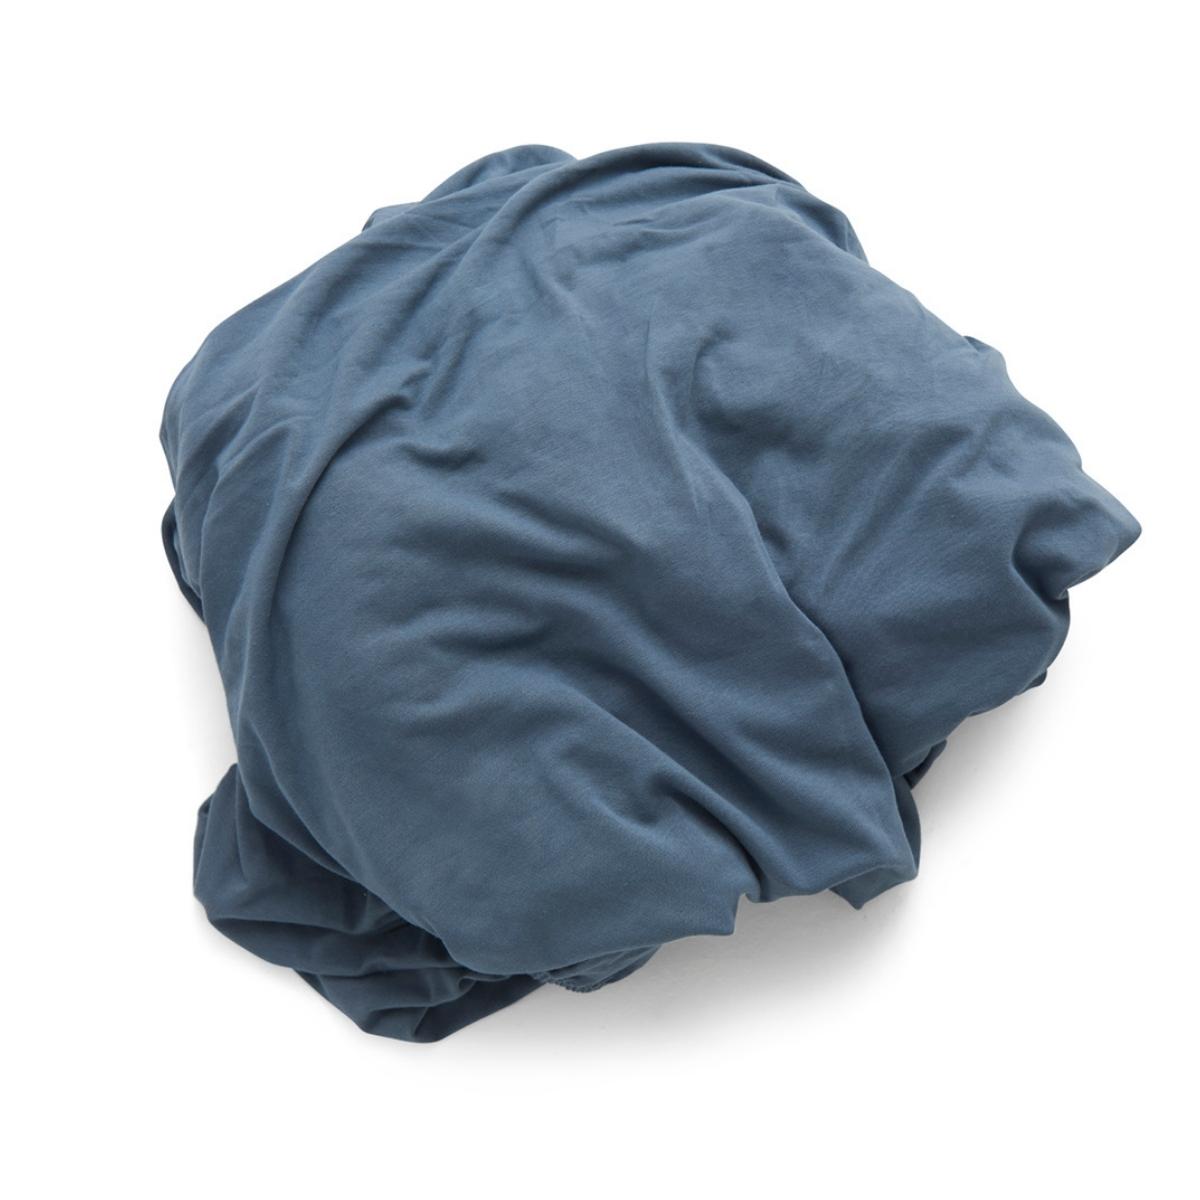 Auping   Jersey Faconlagen Cool Grey 70 cm 200 cm